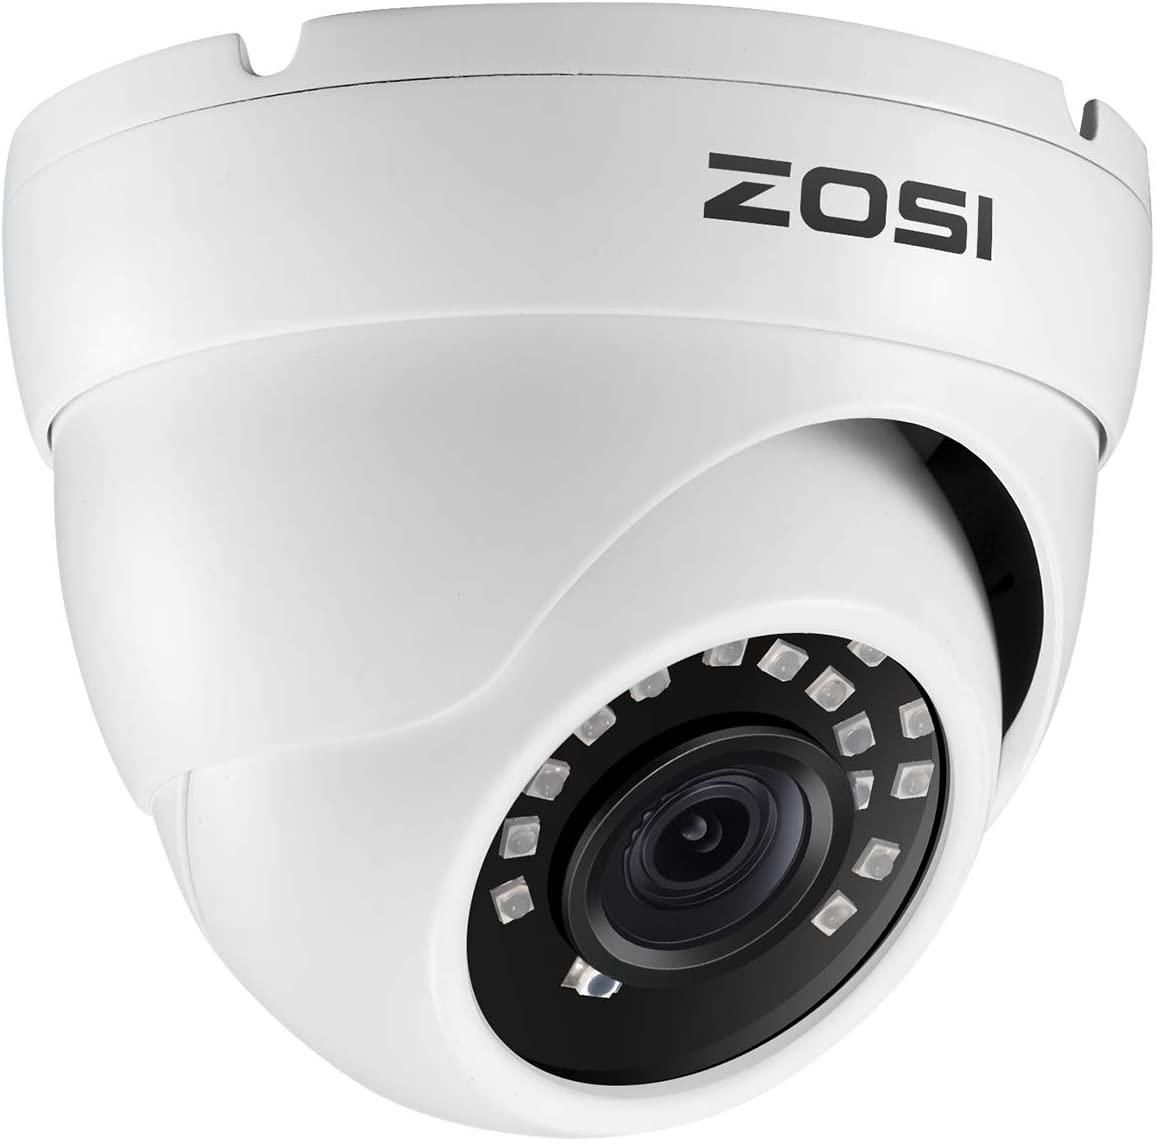 ZOSI 2.0MP 1080P HD 1920TVL Hybrid 4-in-1 TVI/CVI/AHD/960H CVBS Home Security CCTV Camera 24PCS IR-LEDs,80FT Night Vision Indoor Outdoor for 960H,720P,1080P,5MP,4K Analog Surveillance DVR (White)